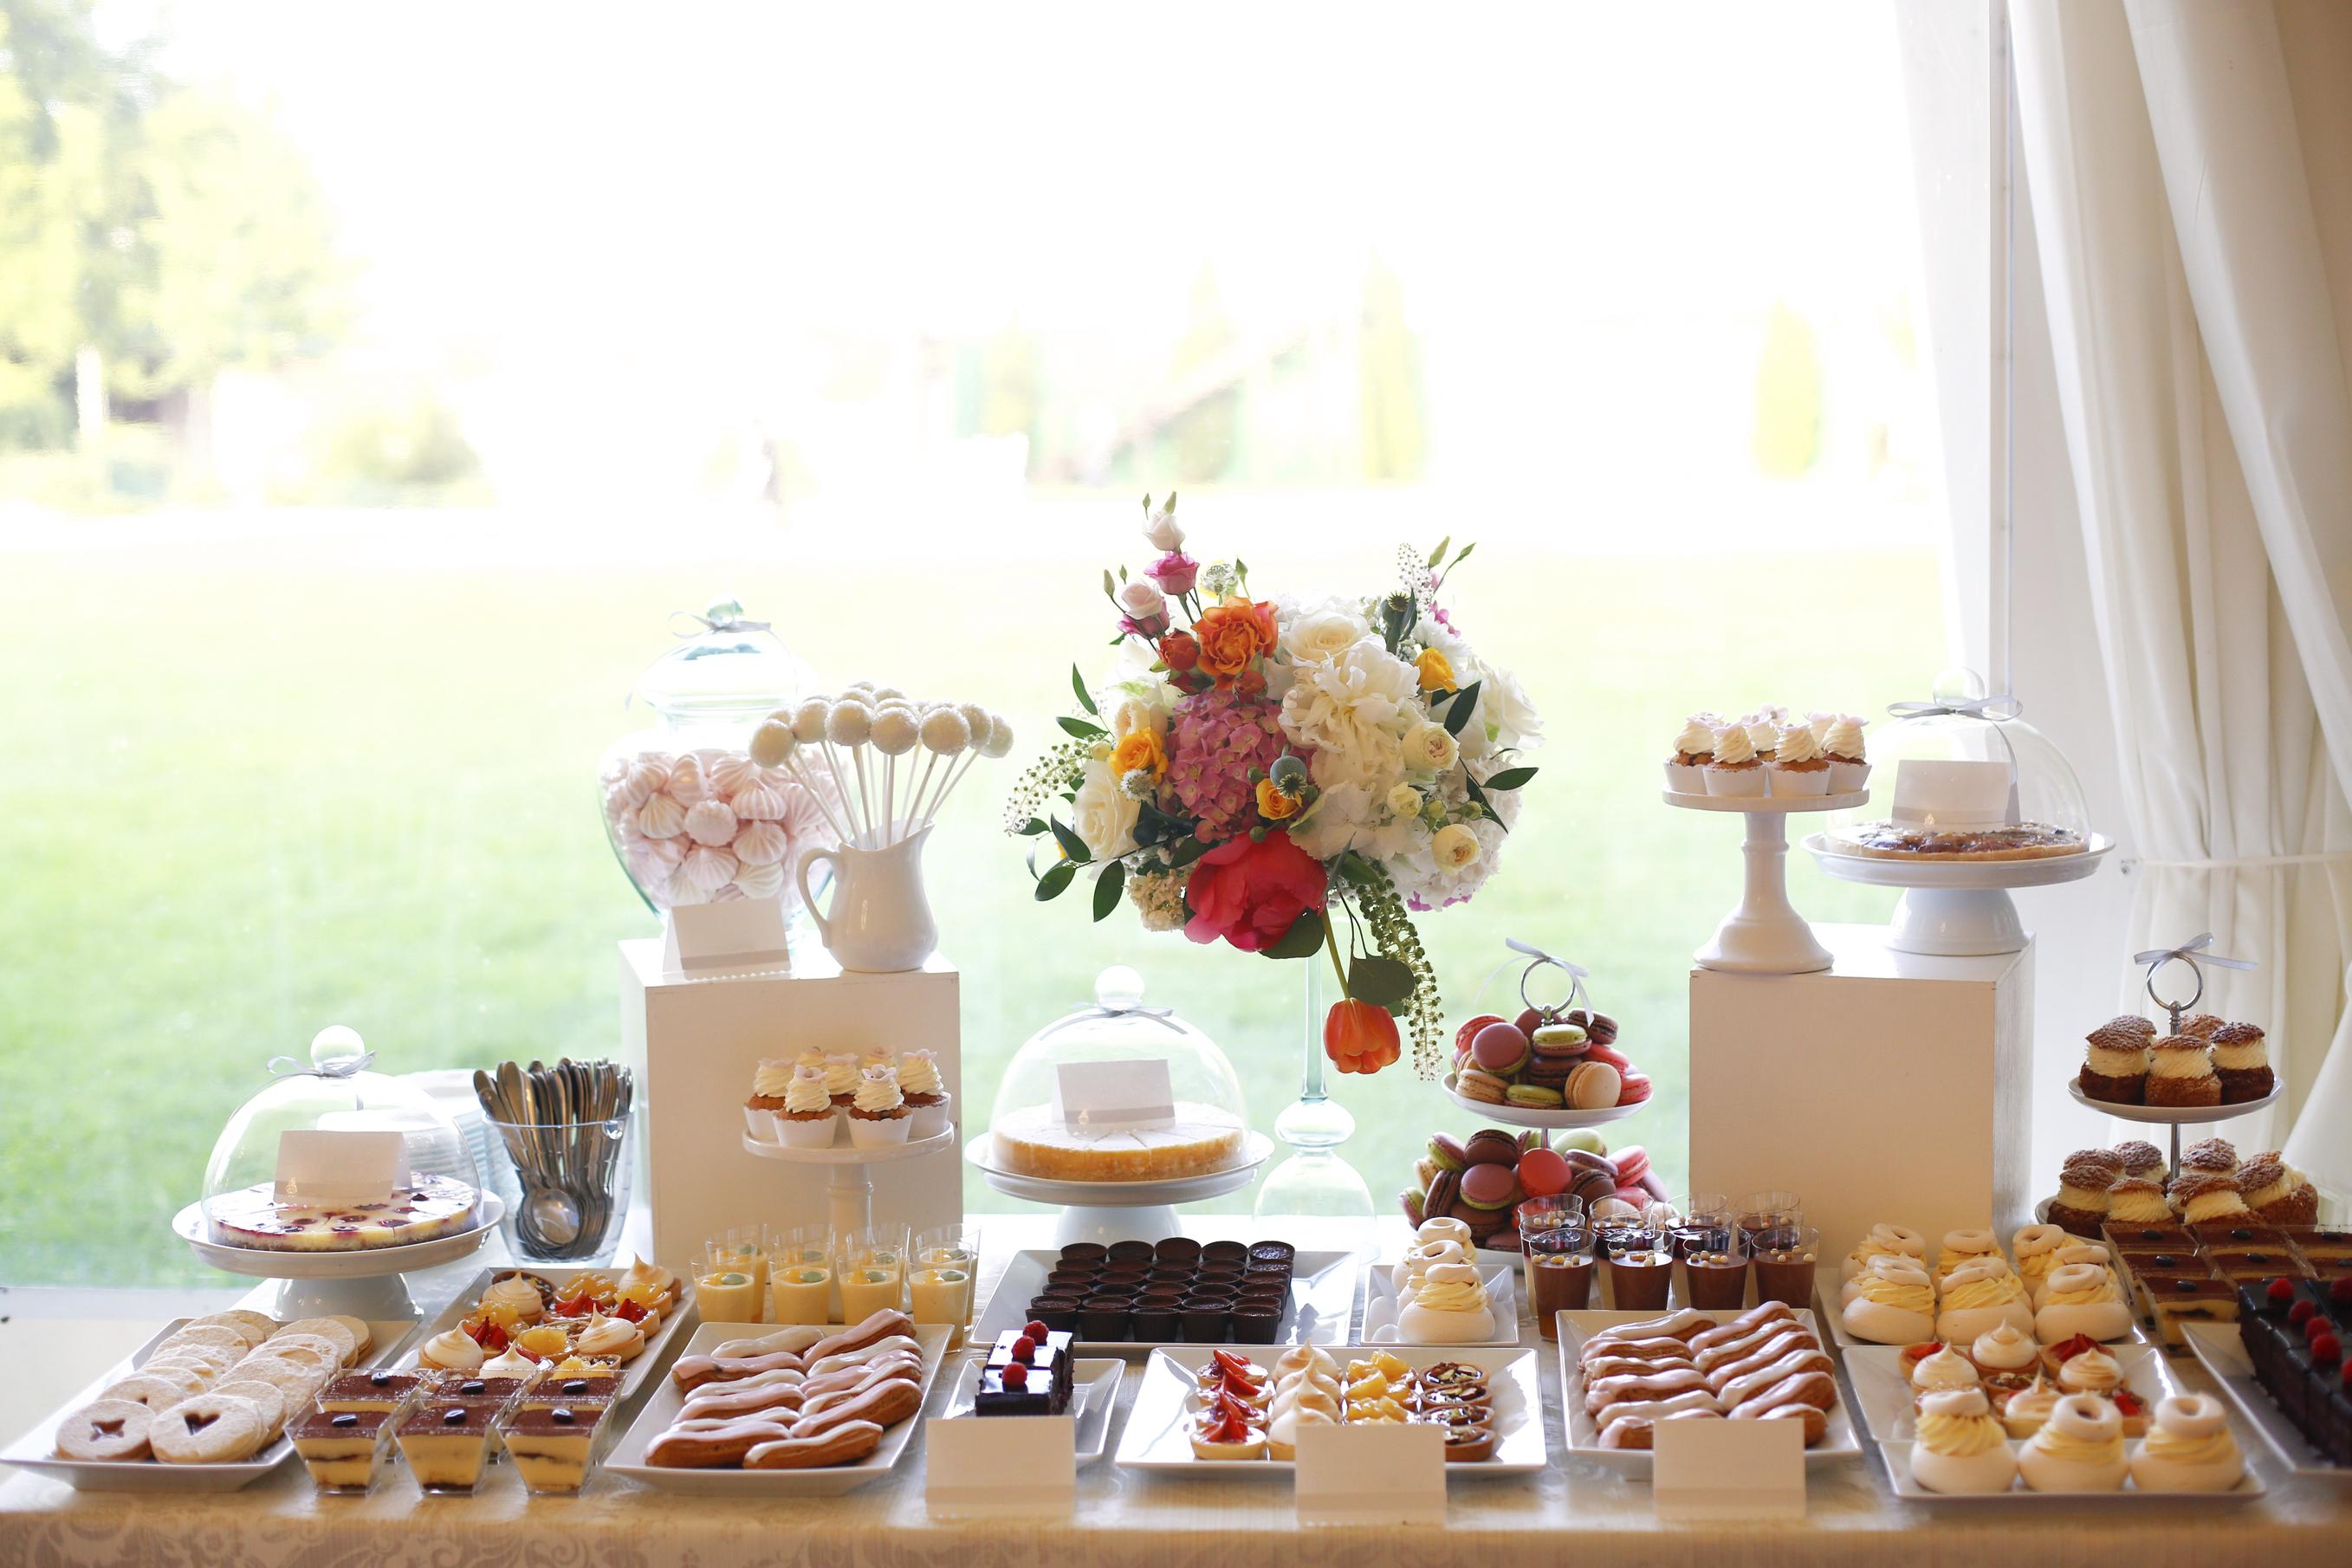 fd707c4da458c2df27b5ac9bd1_AzQ2ZjA0NGNmYmNk_desserts-at-a-ceremony Incroyable De Table Bar Cuisine Conception